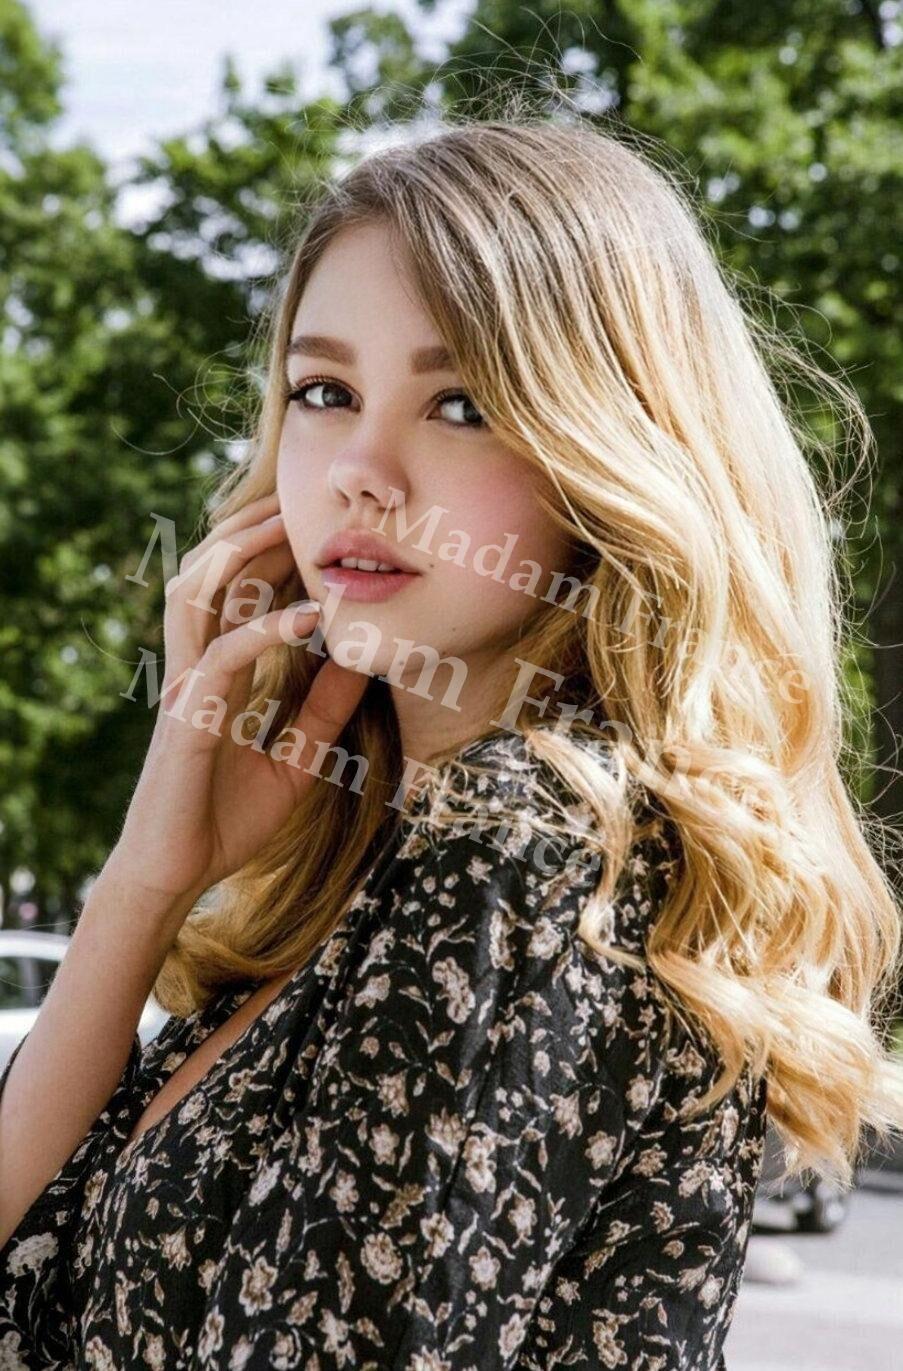 Blondy model on Madam France escort service